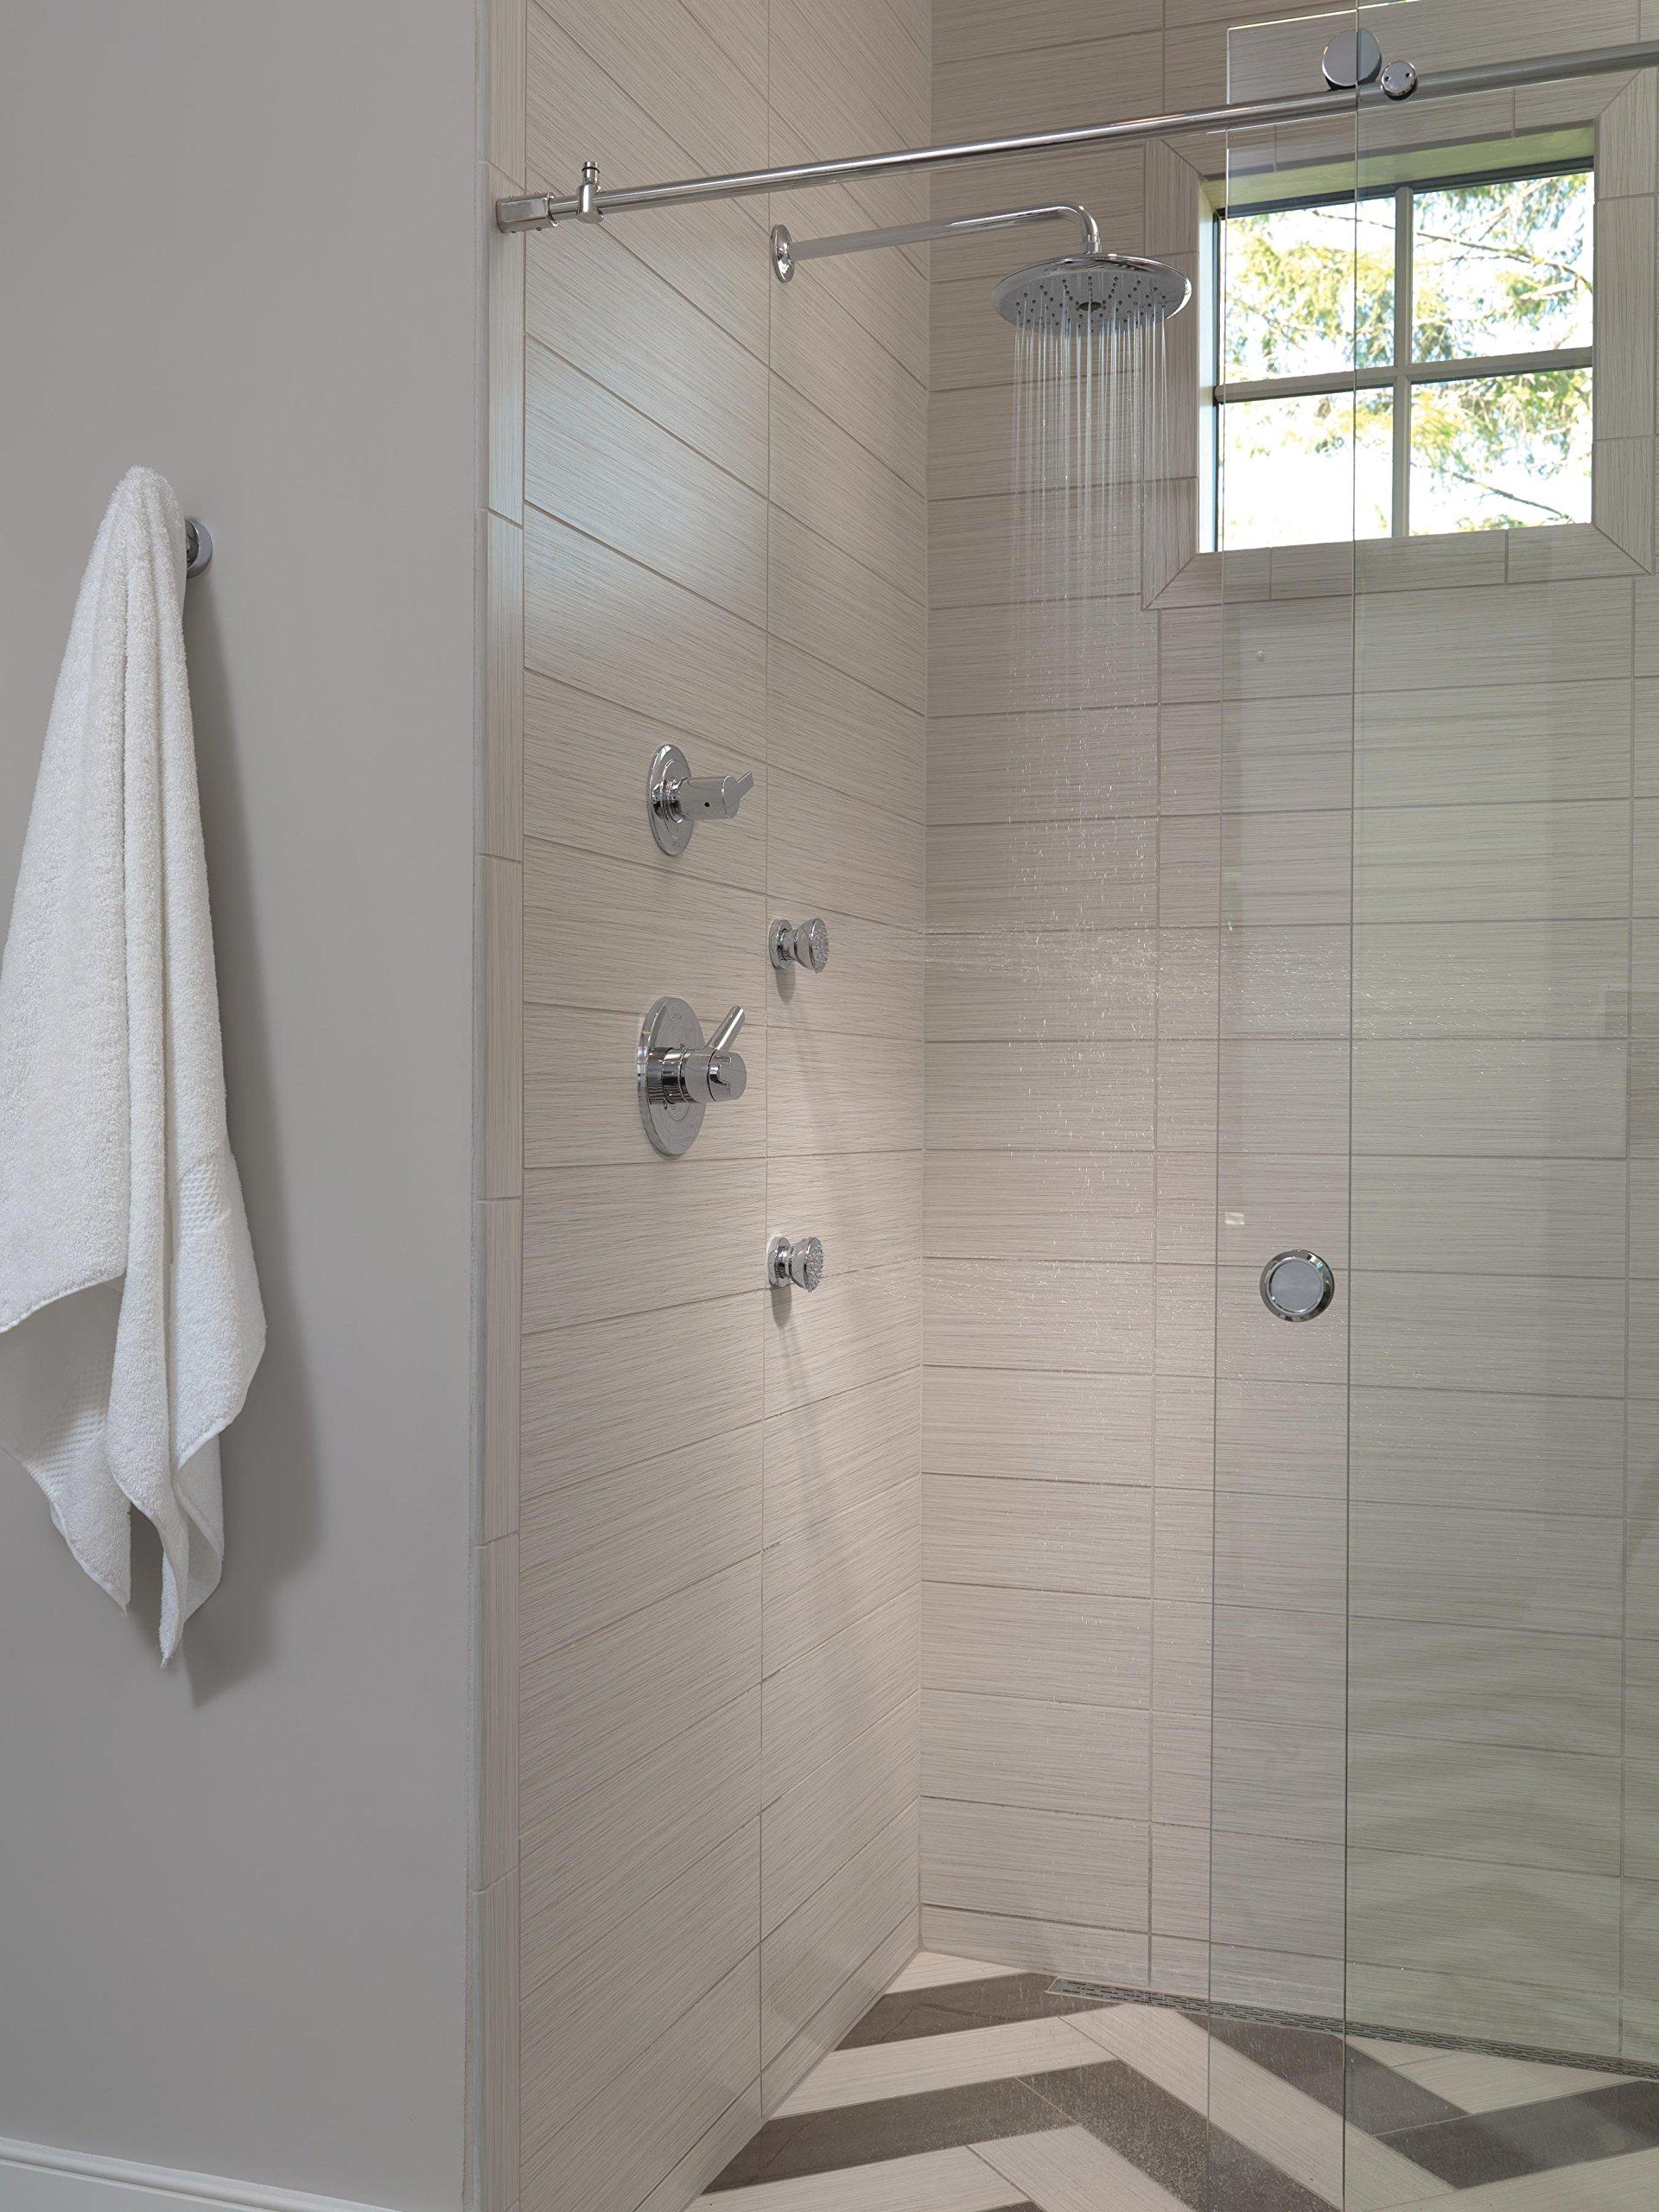 Delta RP52382 Universal Showering Components, Touch-Clean Raincan Showerhead, Chrome by DELTA FAUCET (Image #6)